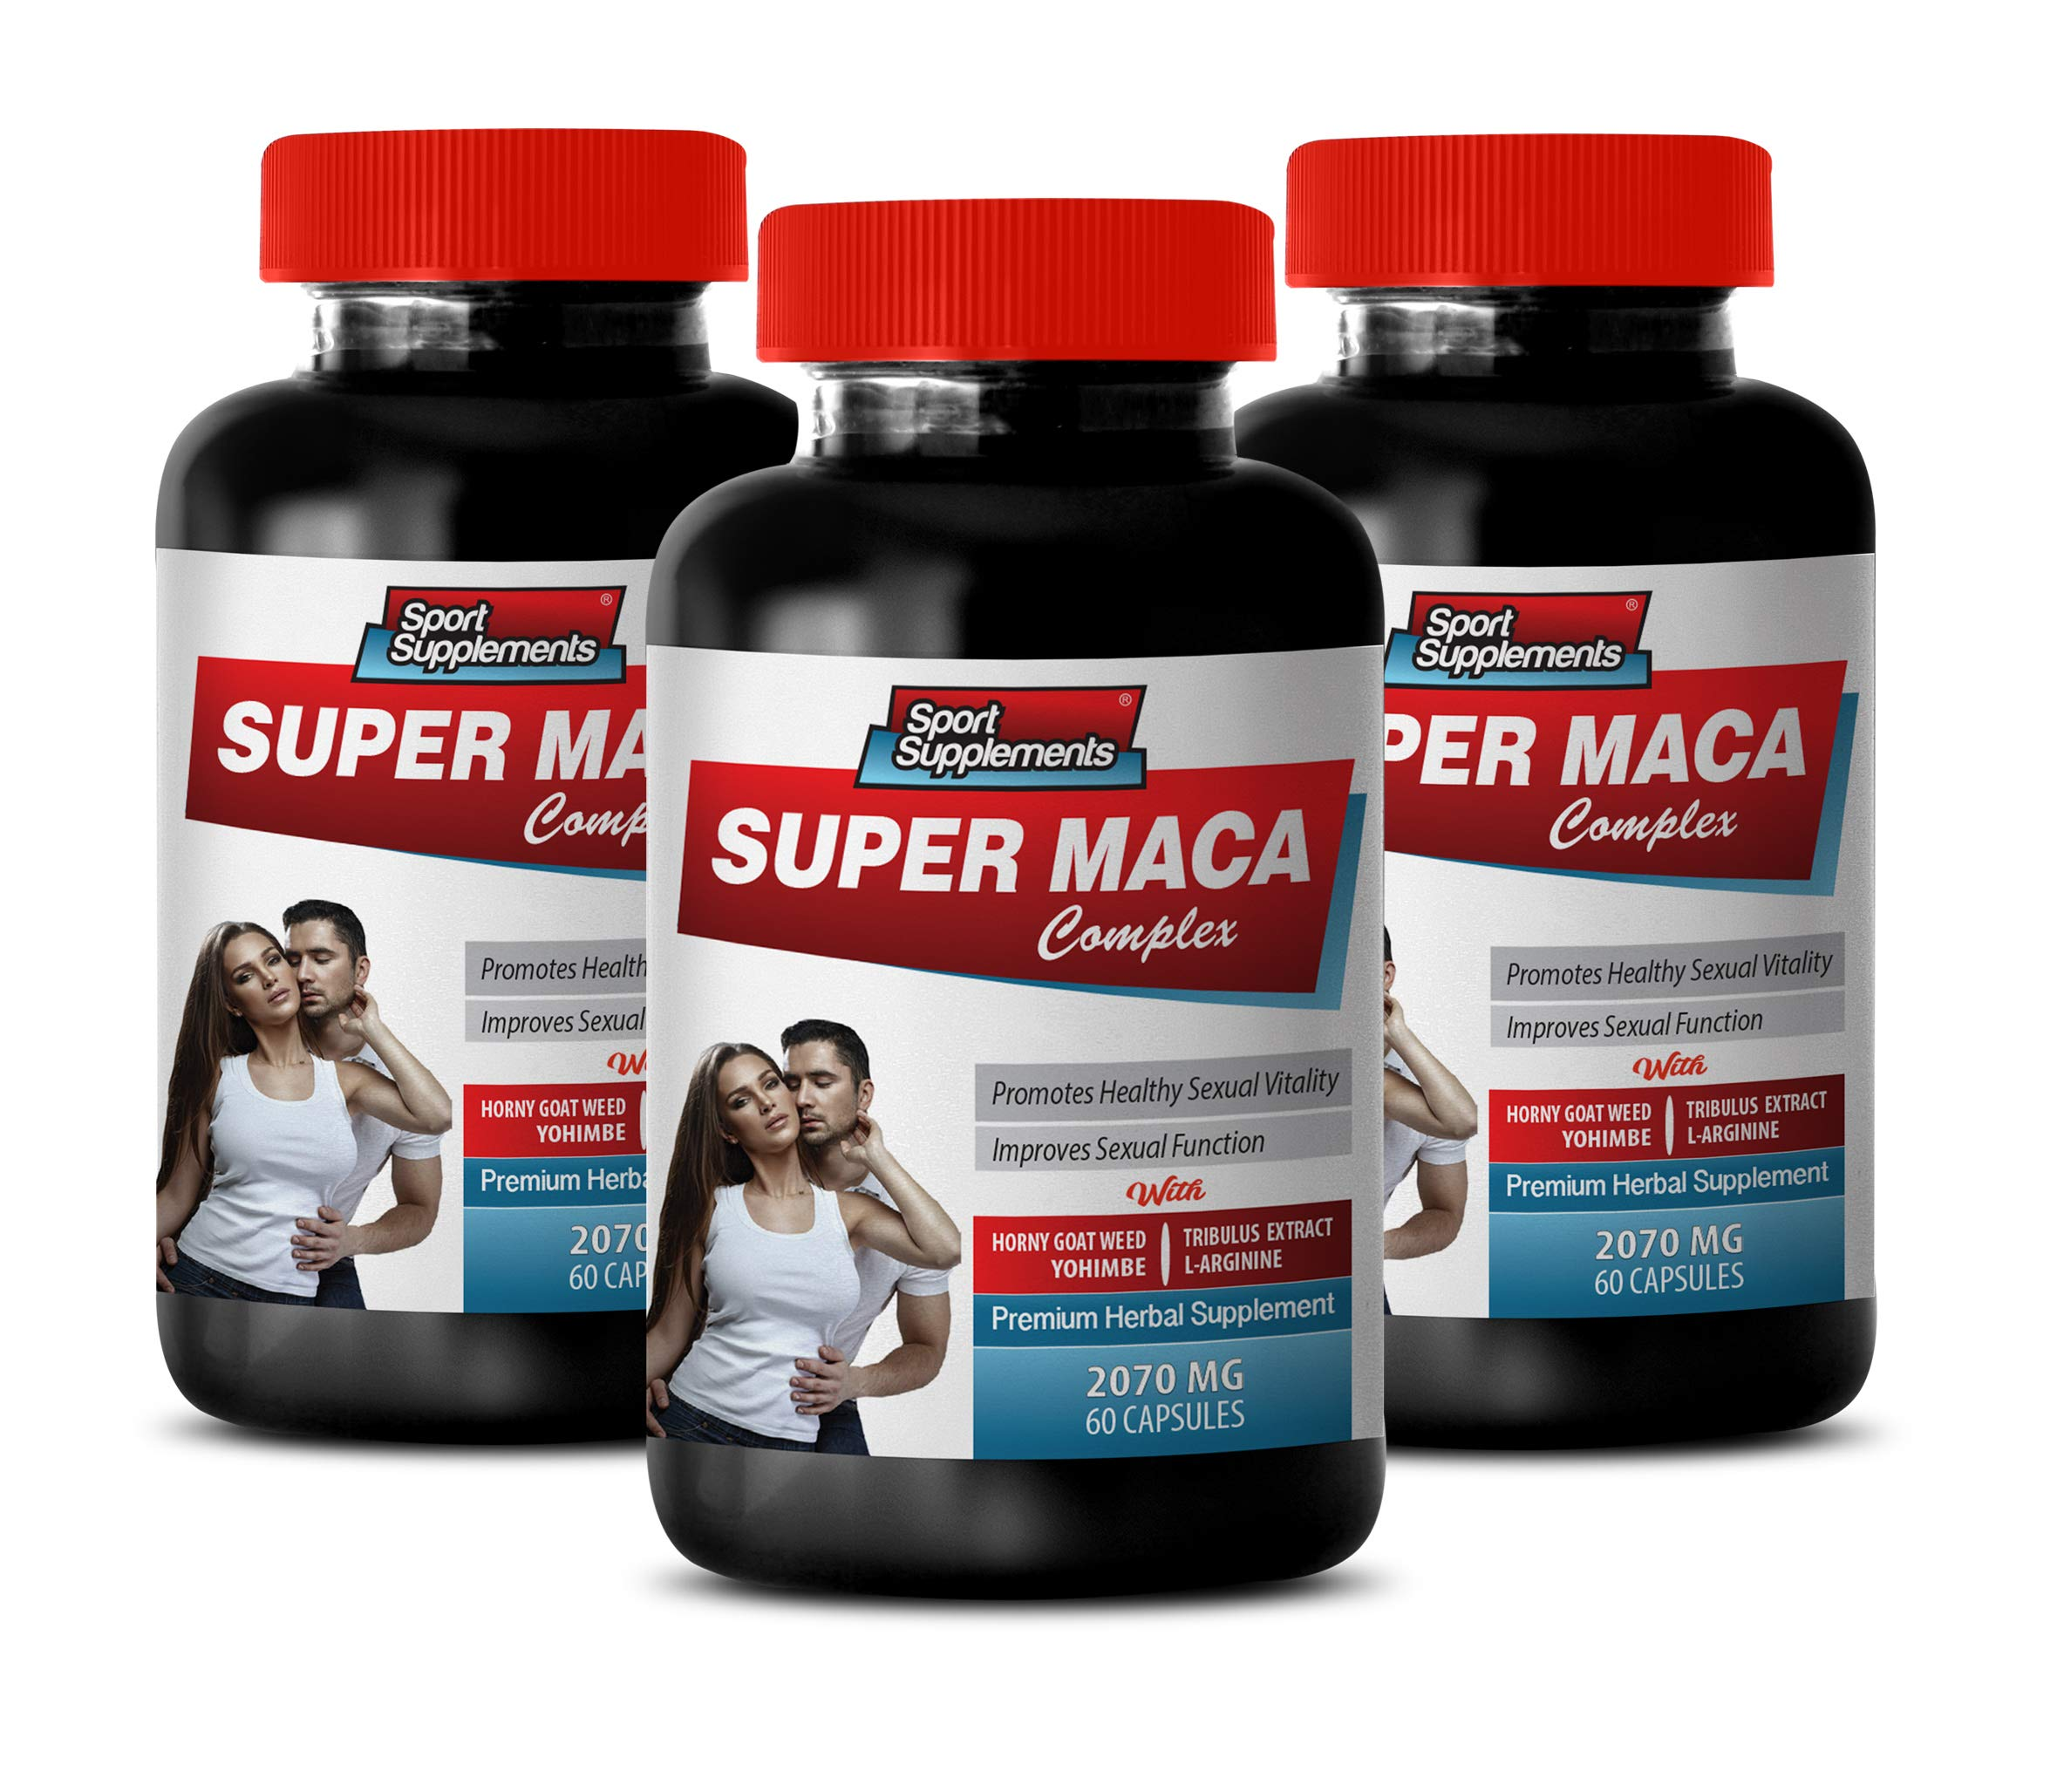 Male Enhancing Pills Last Longer in Bed - Super MACA Complex - Premium Herbal Supplements - yohimbe Supplement for Men - 3 Bottles 180 Capsules by Sport Supplements